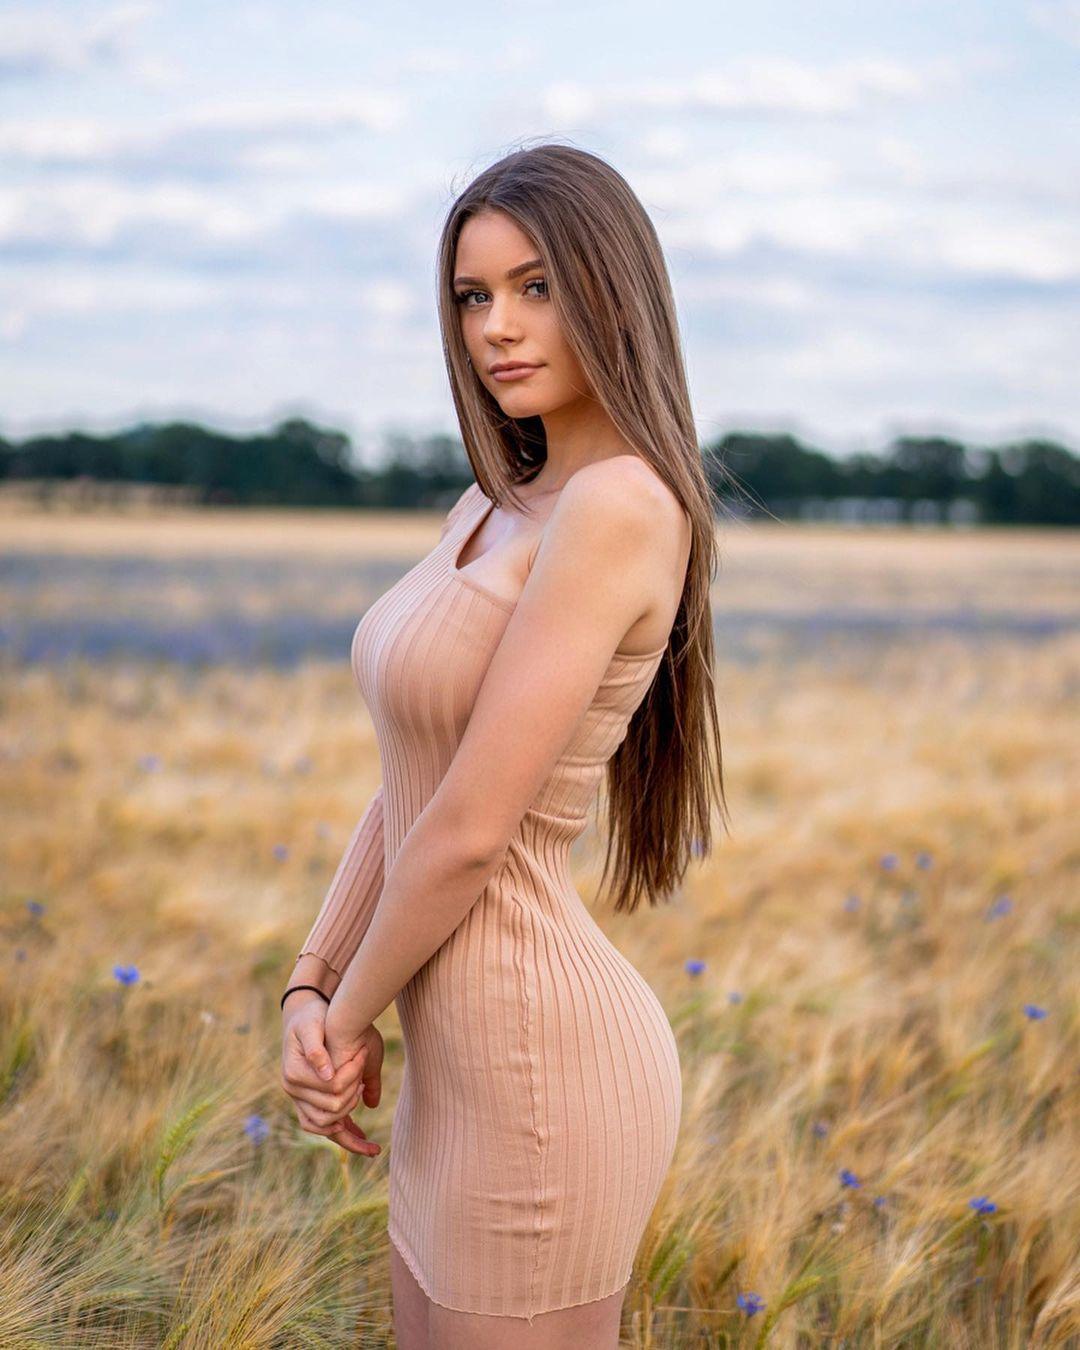 Emilia-Bte-Wallpapers-Insta-Fit-Bio-17